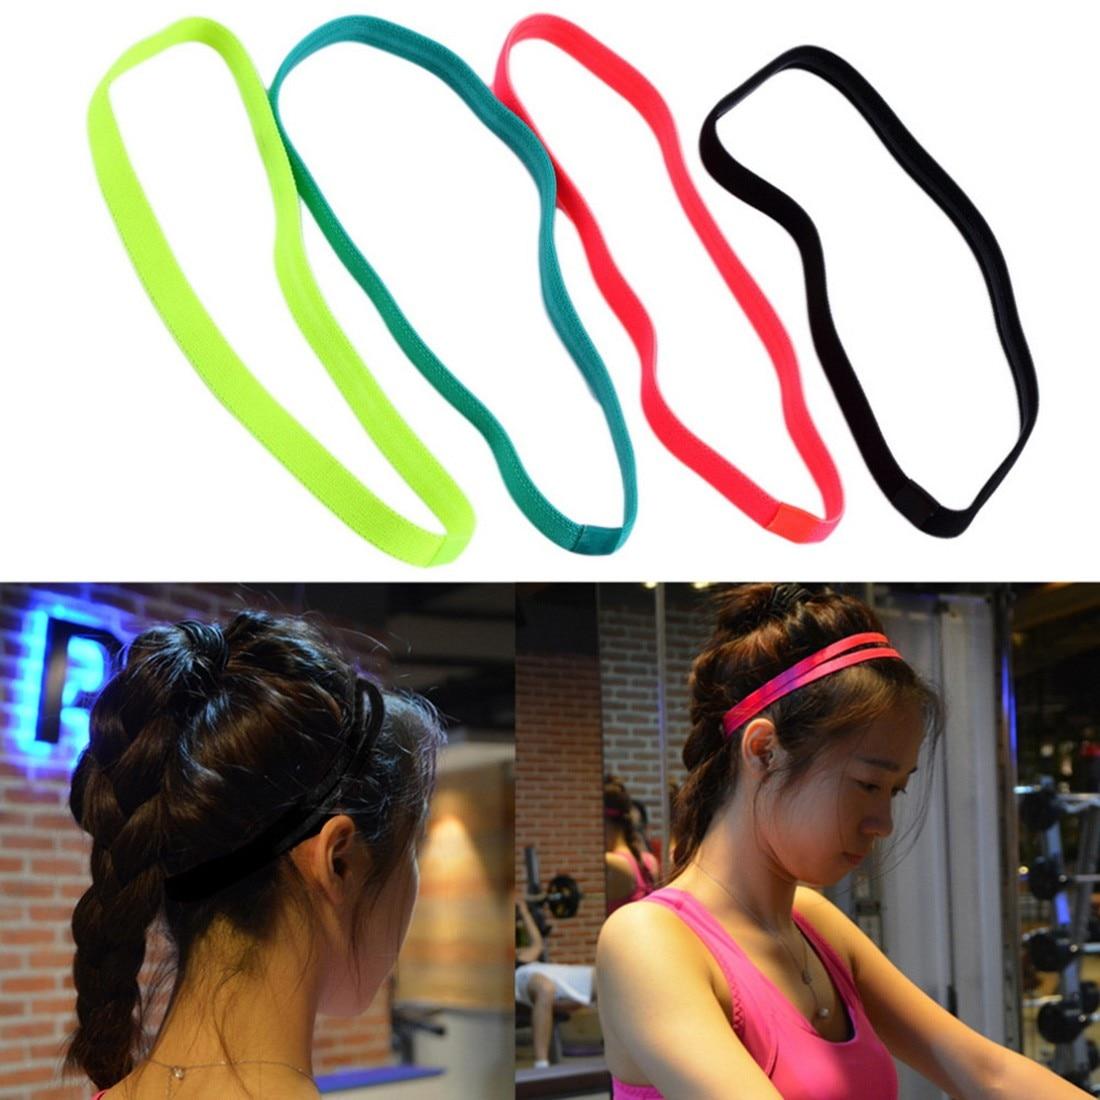 New arrival Men Women Yoga Hair Bands Sports Headband Anti-Slip Elastic Rubber Sweatband Yoga Running Football Biking Headband